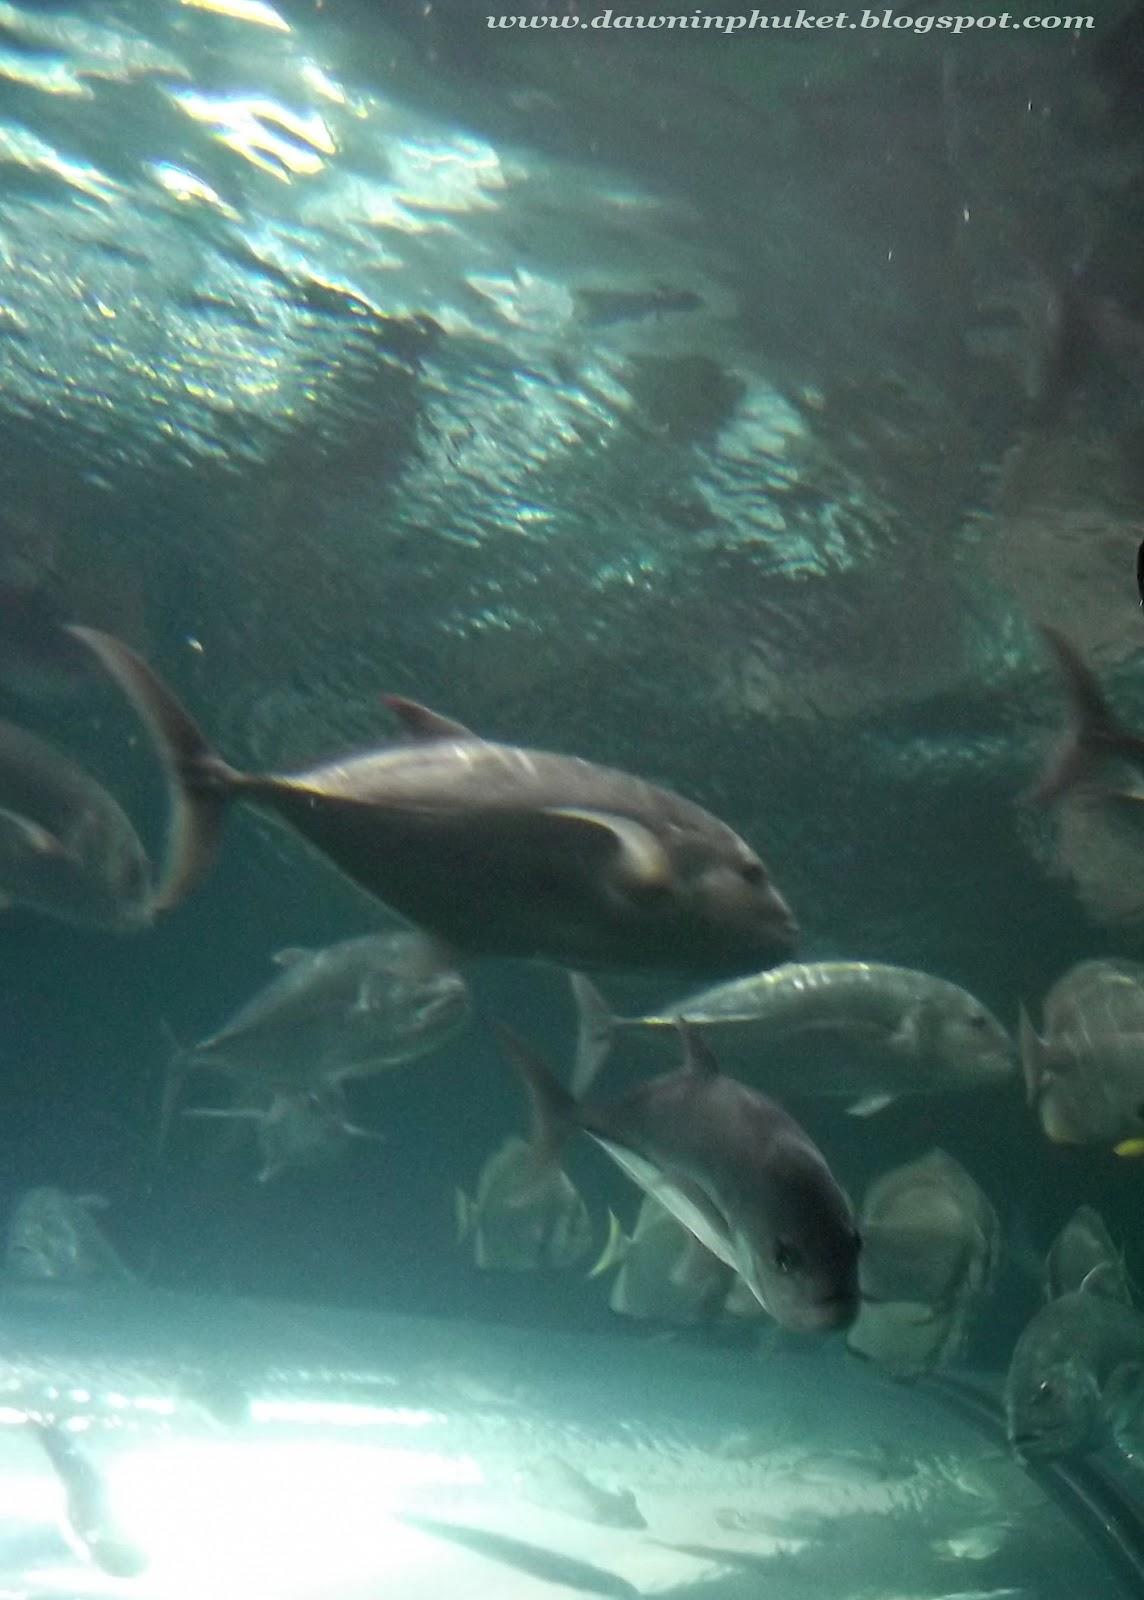 Dawn in Phuket: Phuket Aquarium สถานแสดงพันธุ์สัตว์น้ำ ภูเก็ต